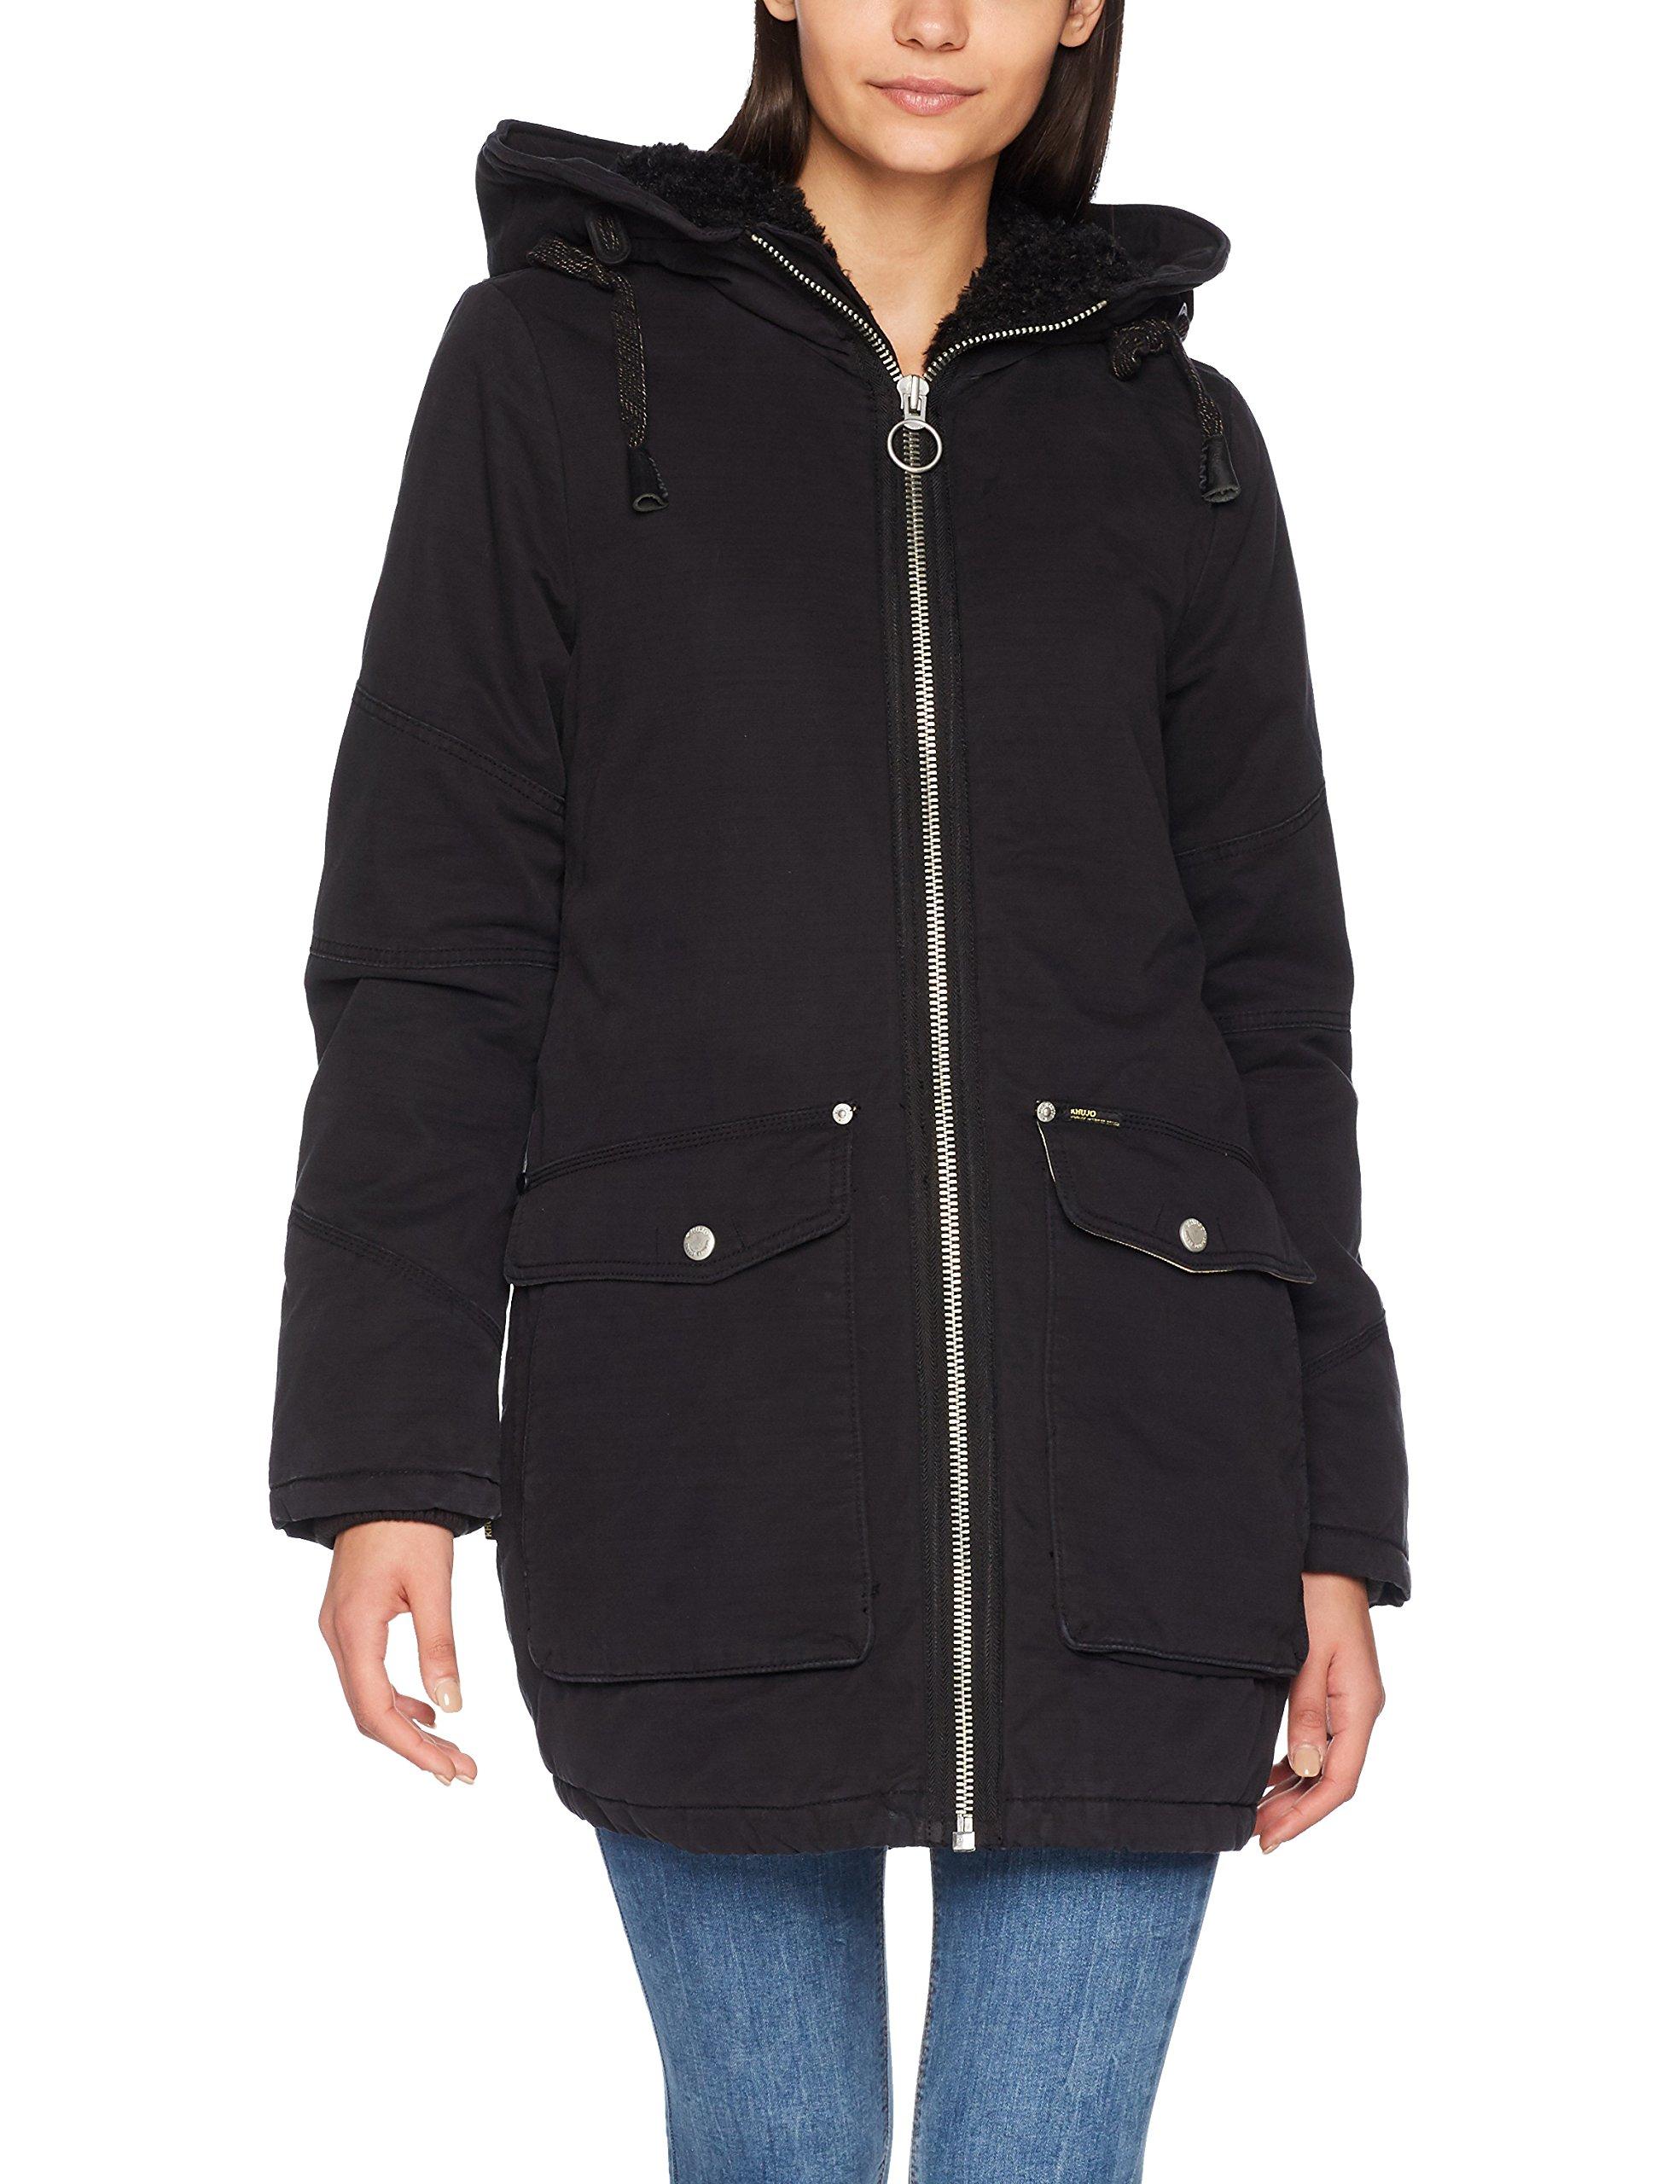 Jacket blk jAllrouders Femme Khujo BlousonSchwarzwas Clareh J05Large jVpqMLGSUz